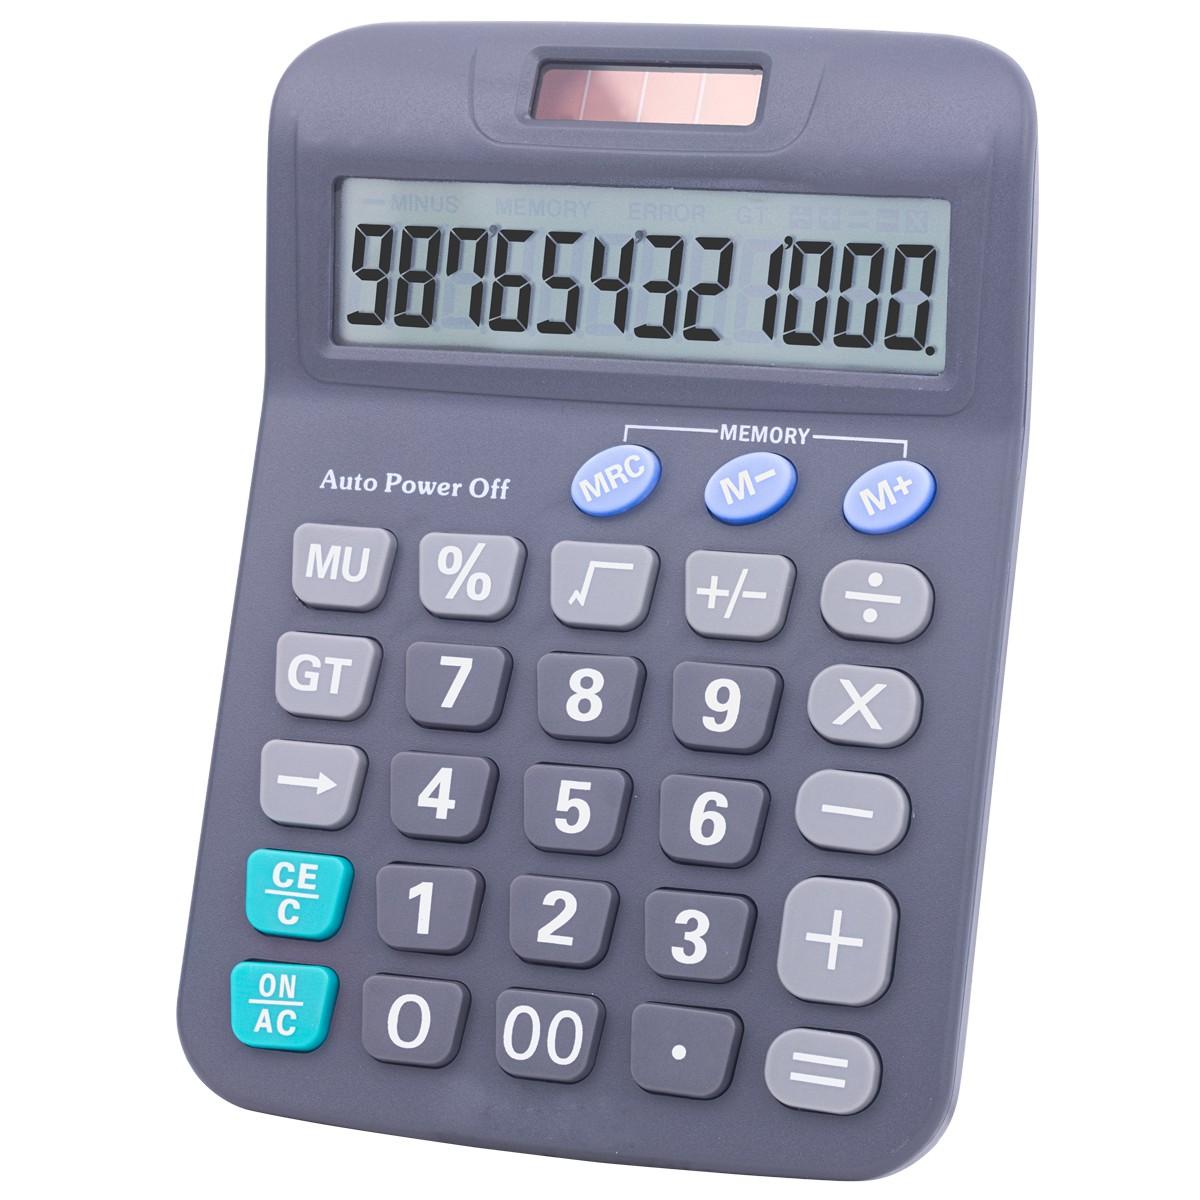 6032 12 - Digit Solar Desktop Calculator